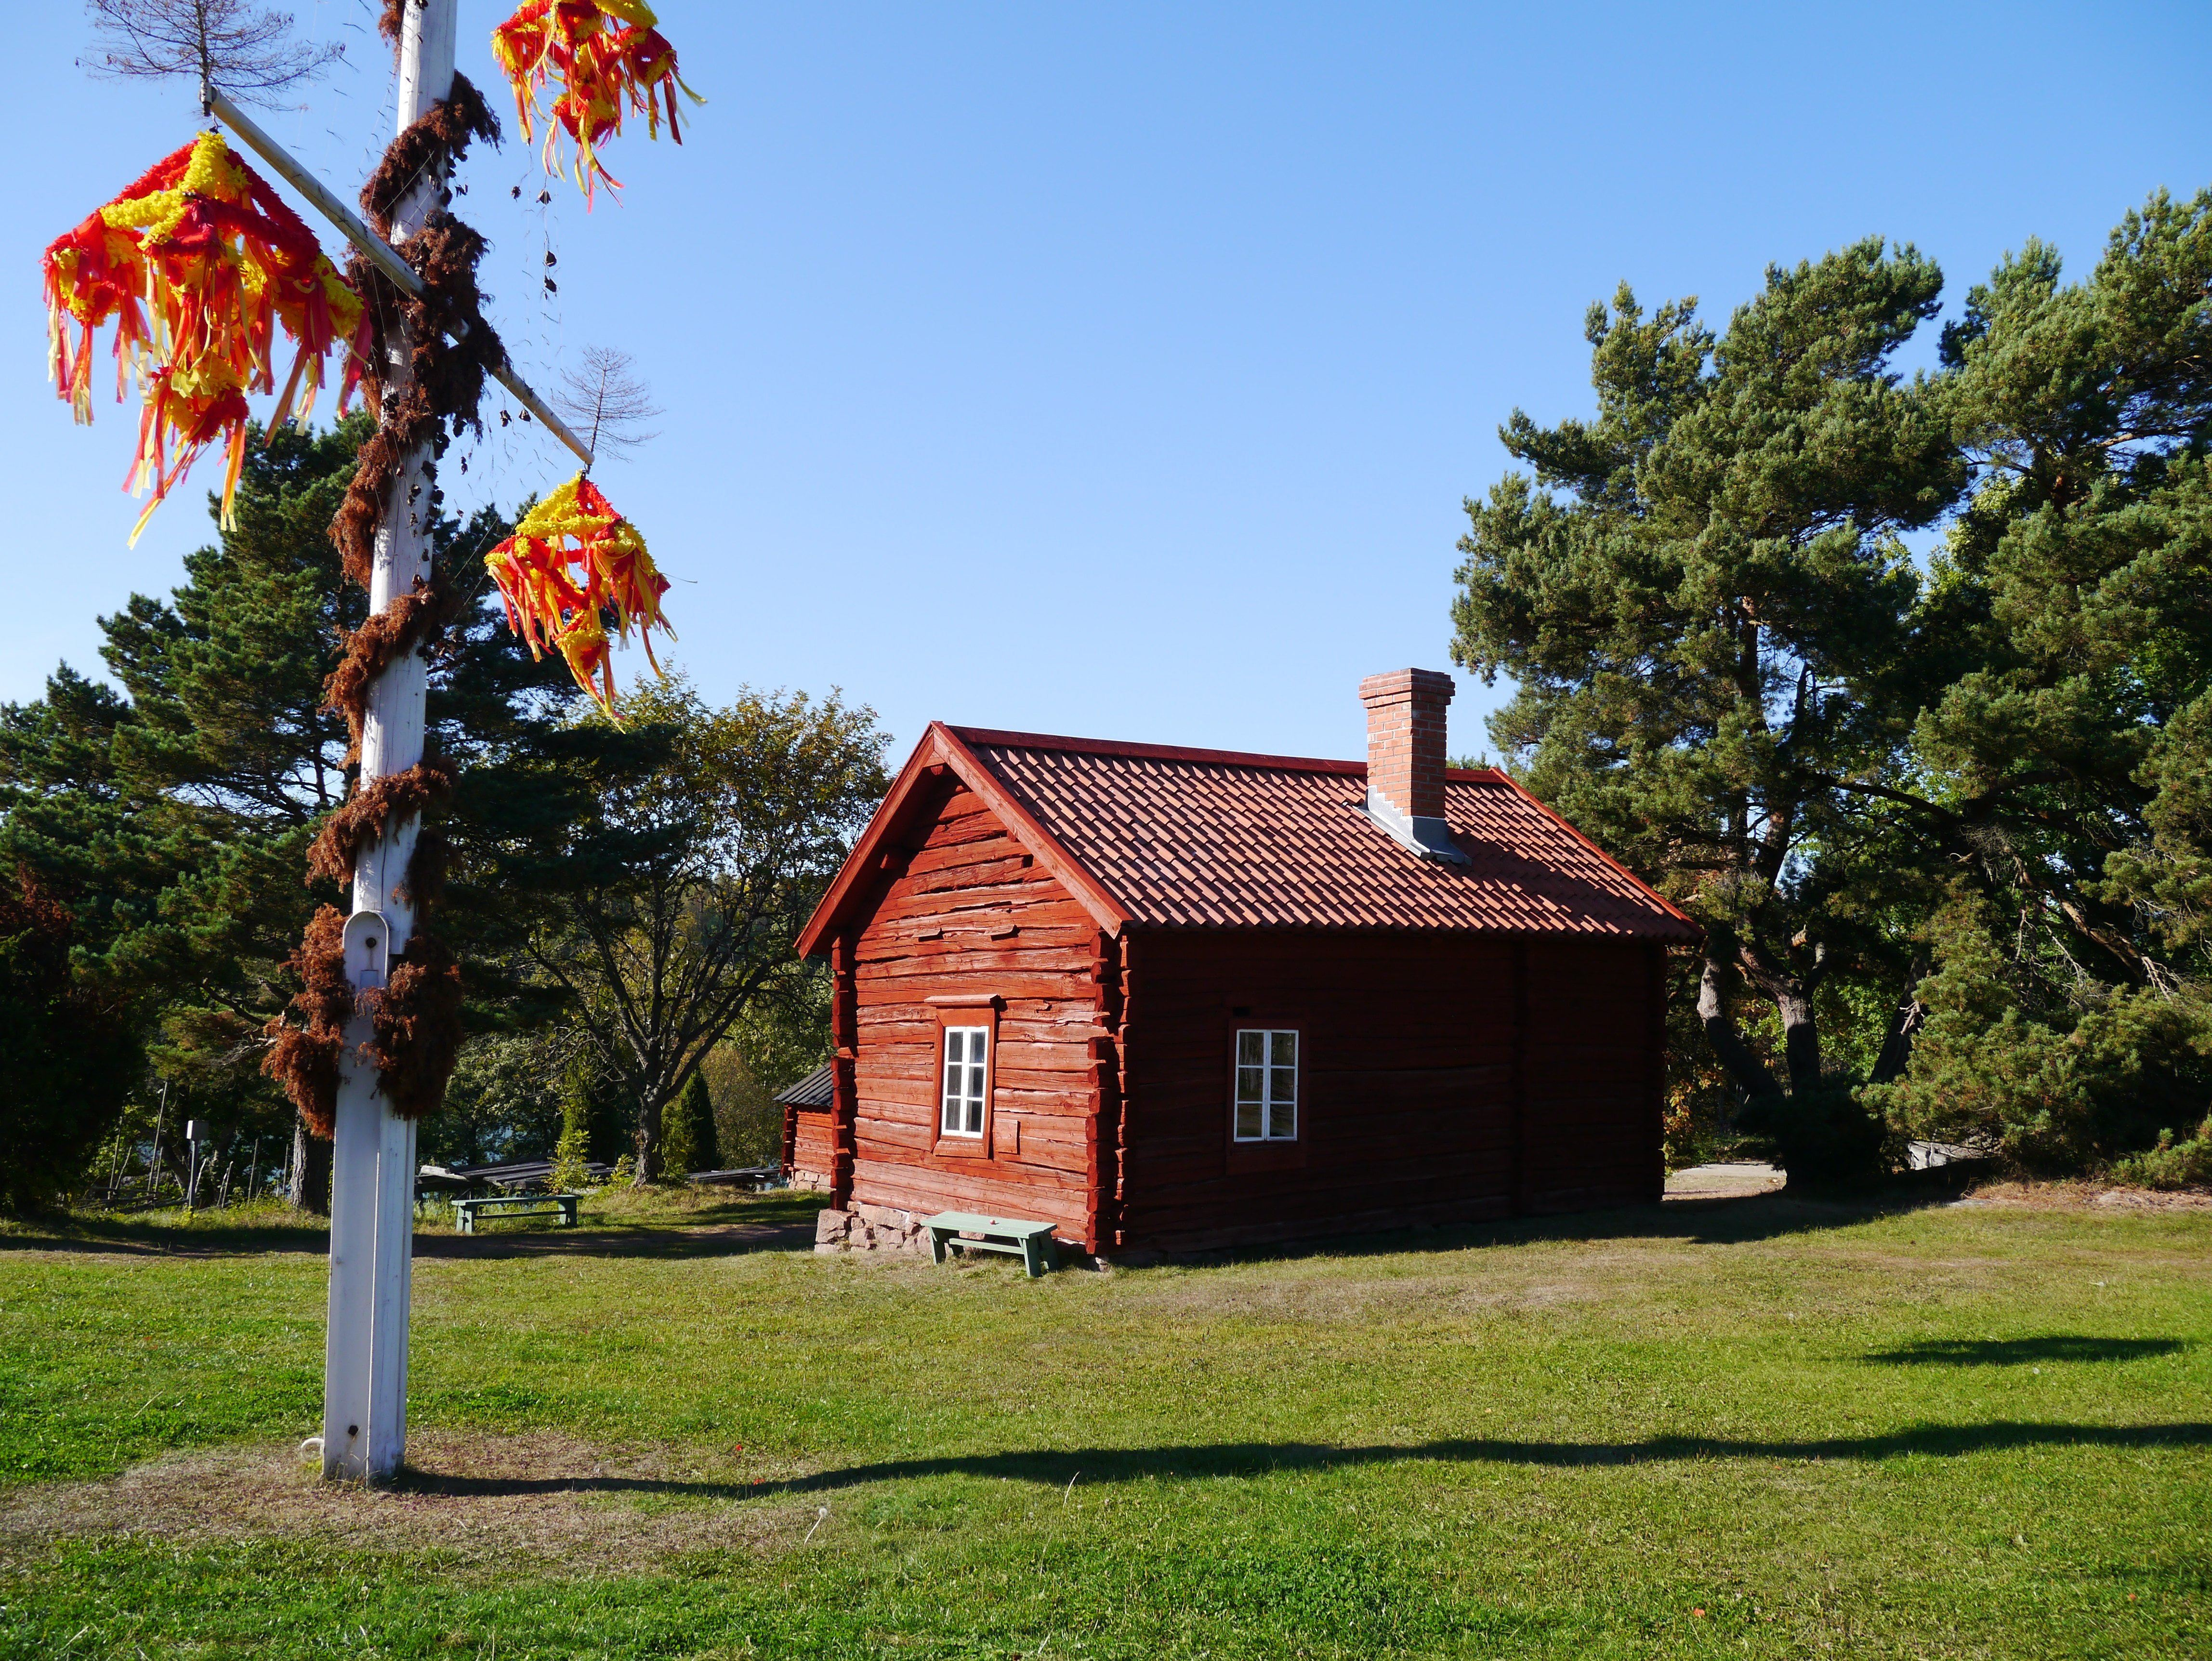 Jan Karlsgårdenin ulkoilmamuseo